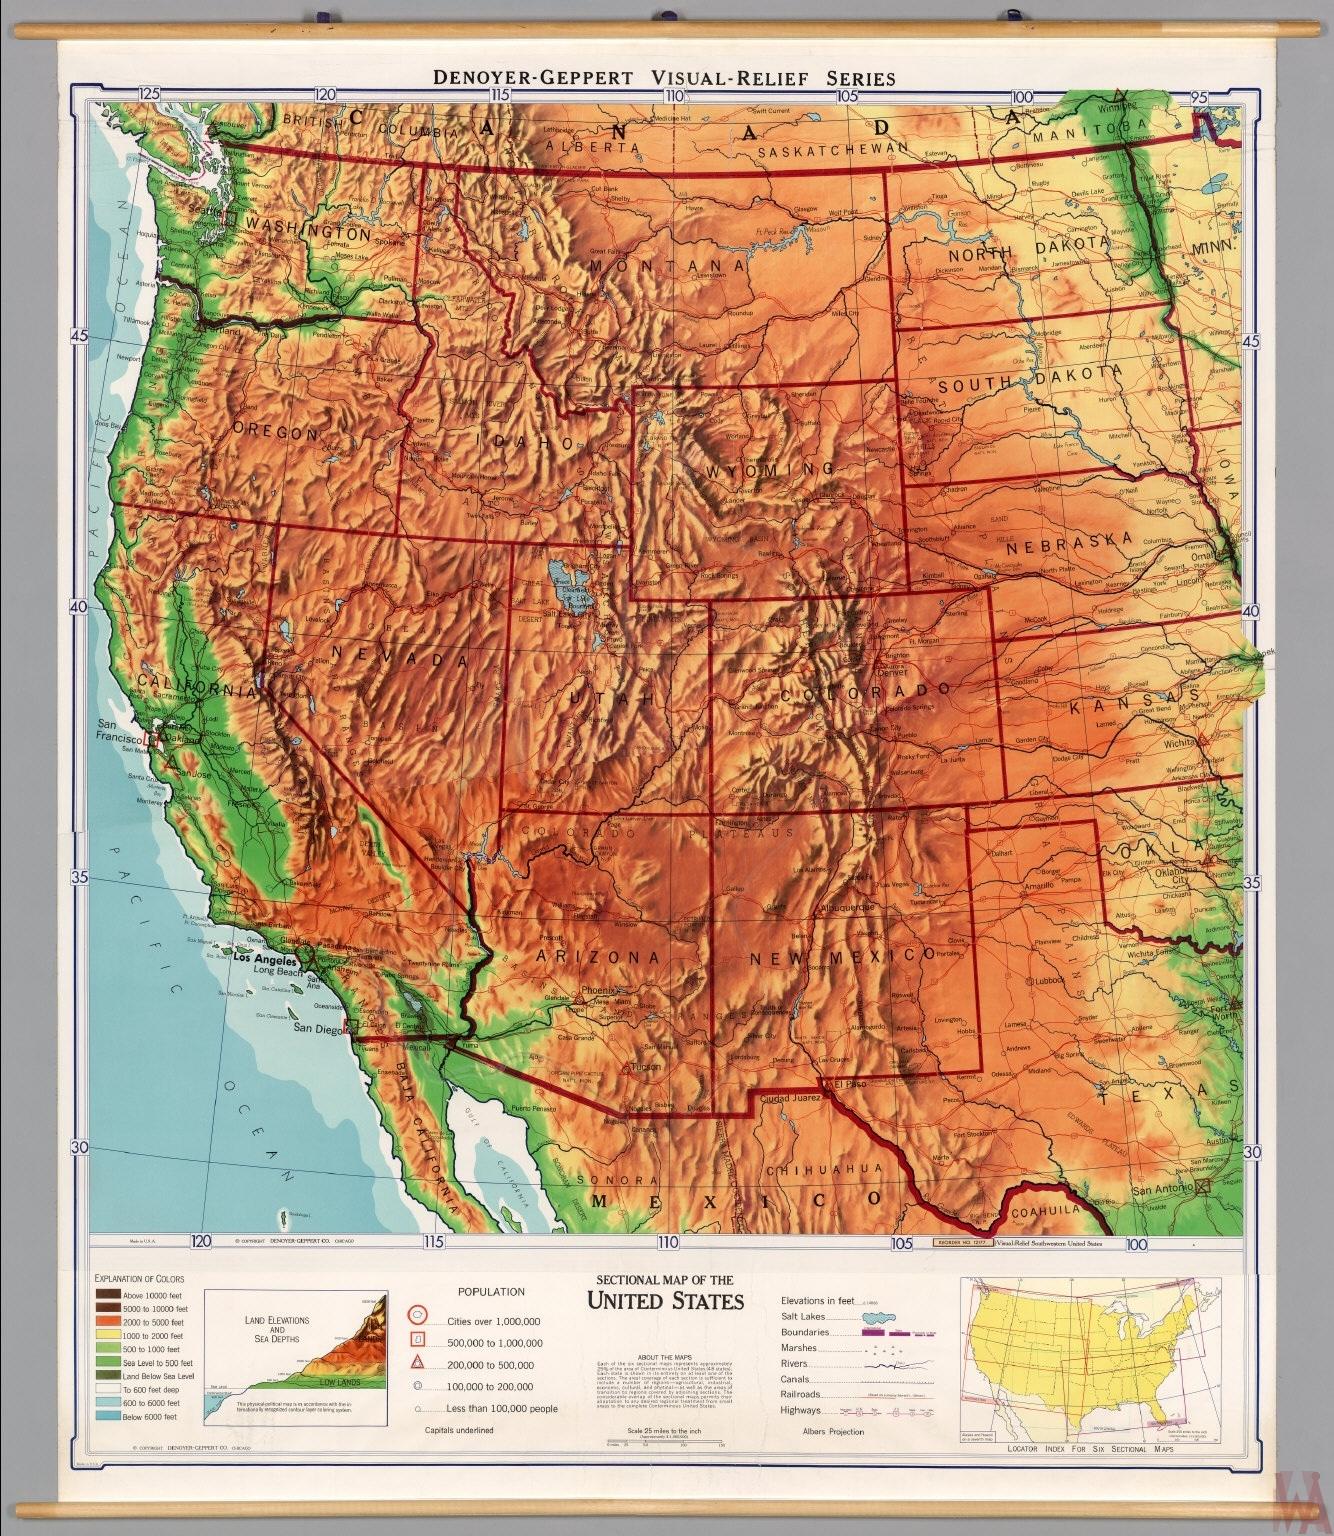 Population map West USA